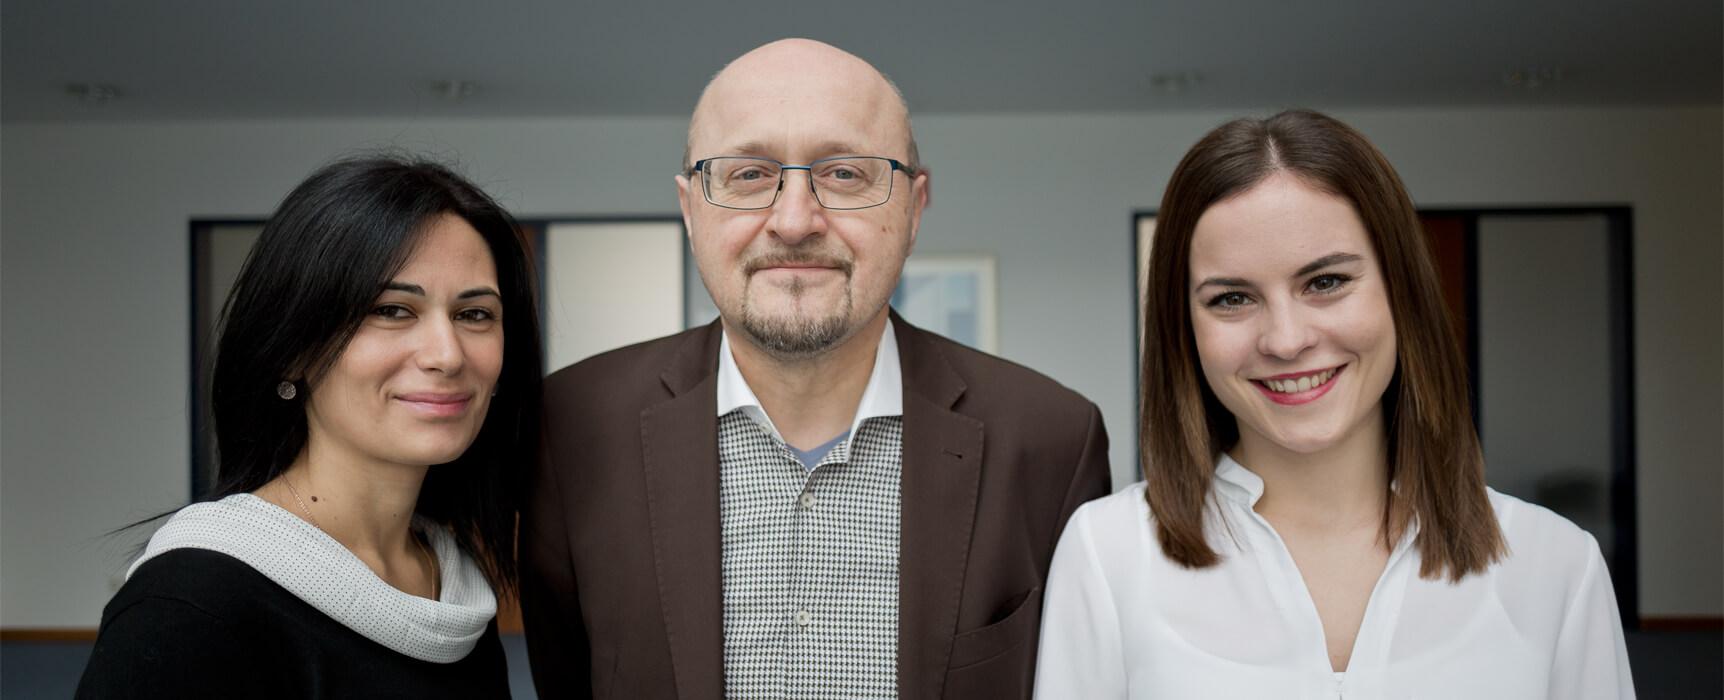 Das Team von AC assistenza & consulting - Marie-Christine Lindl, Roberto Tissino,  Federica Febbraio / il team di AC